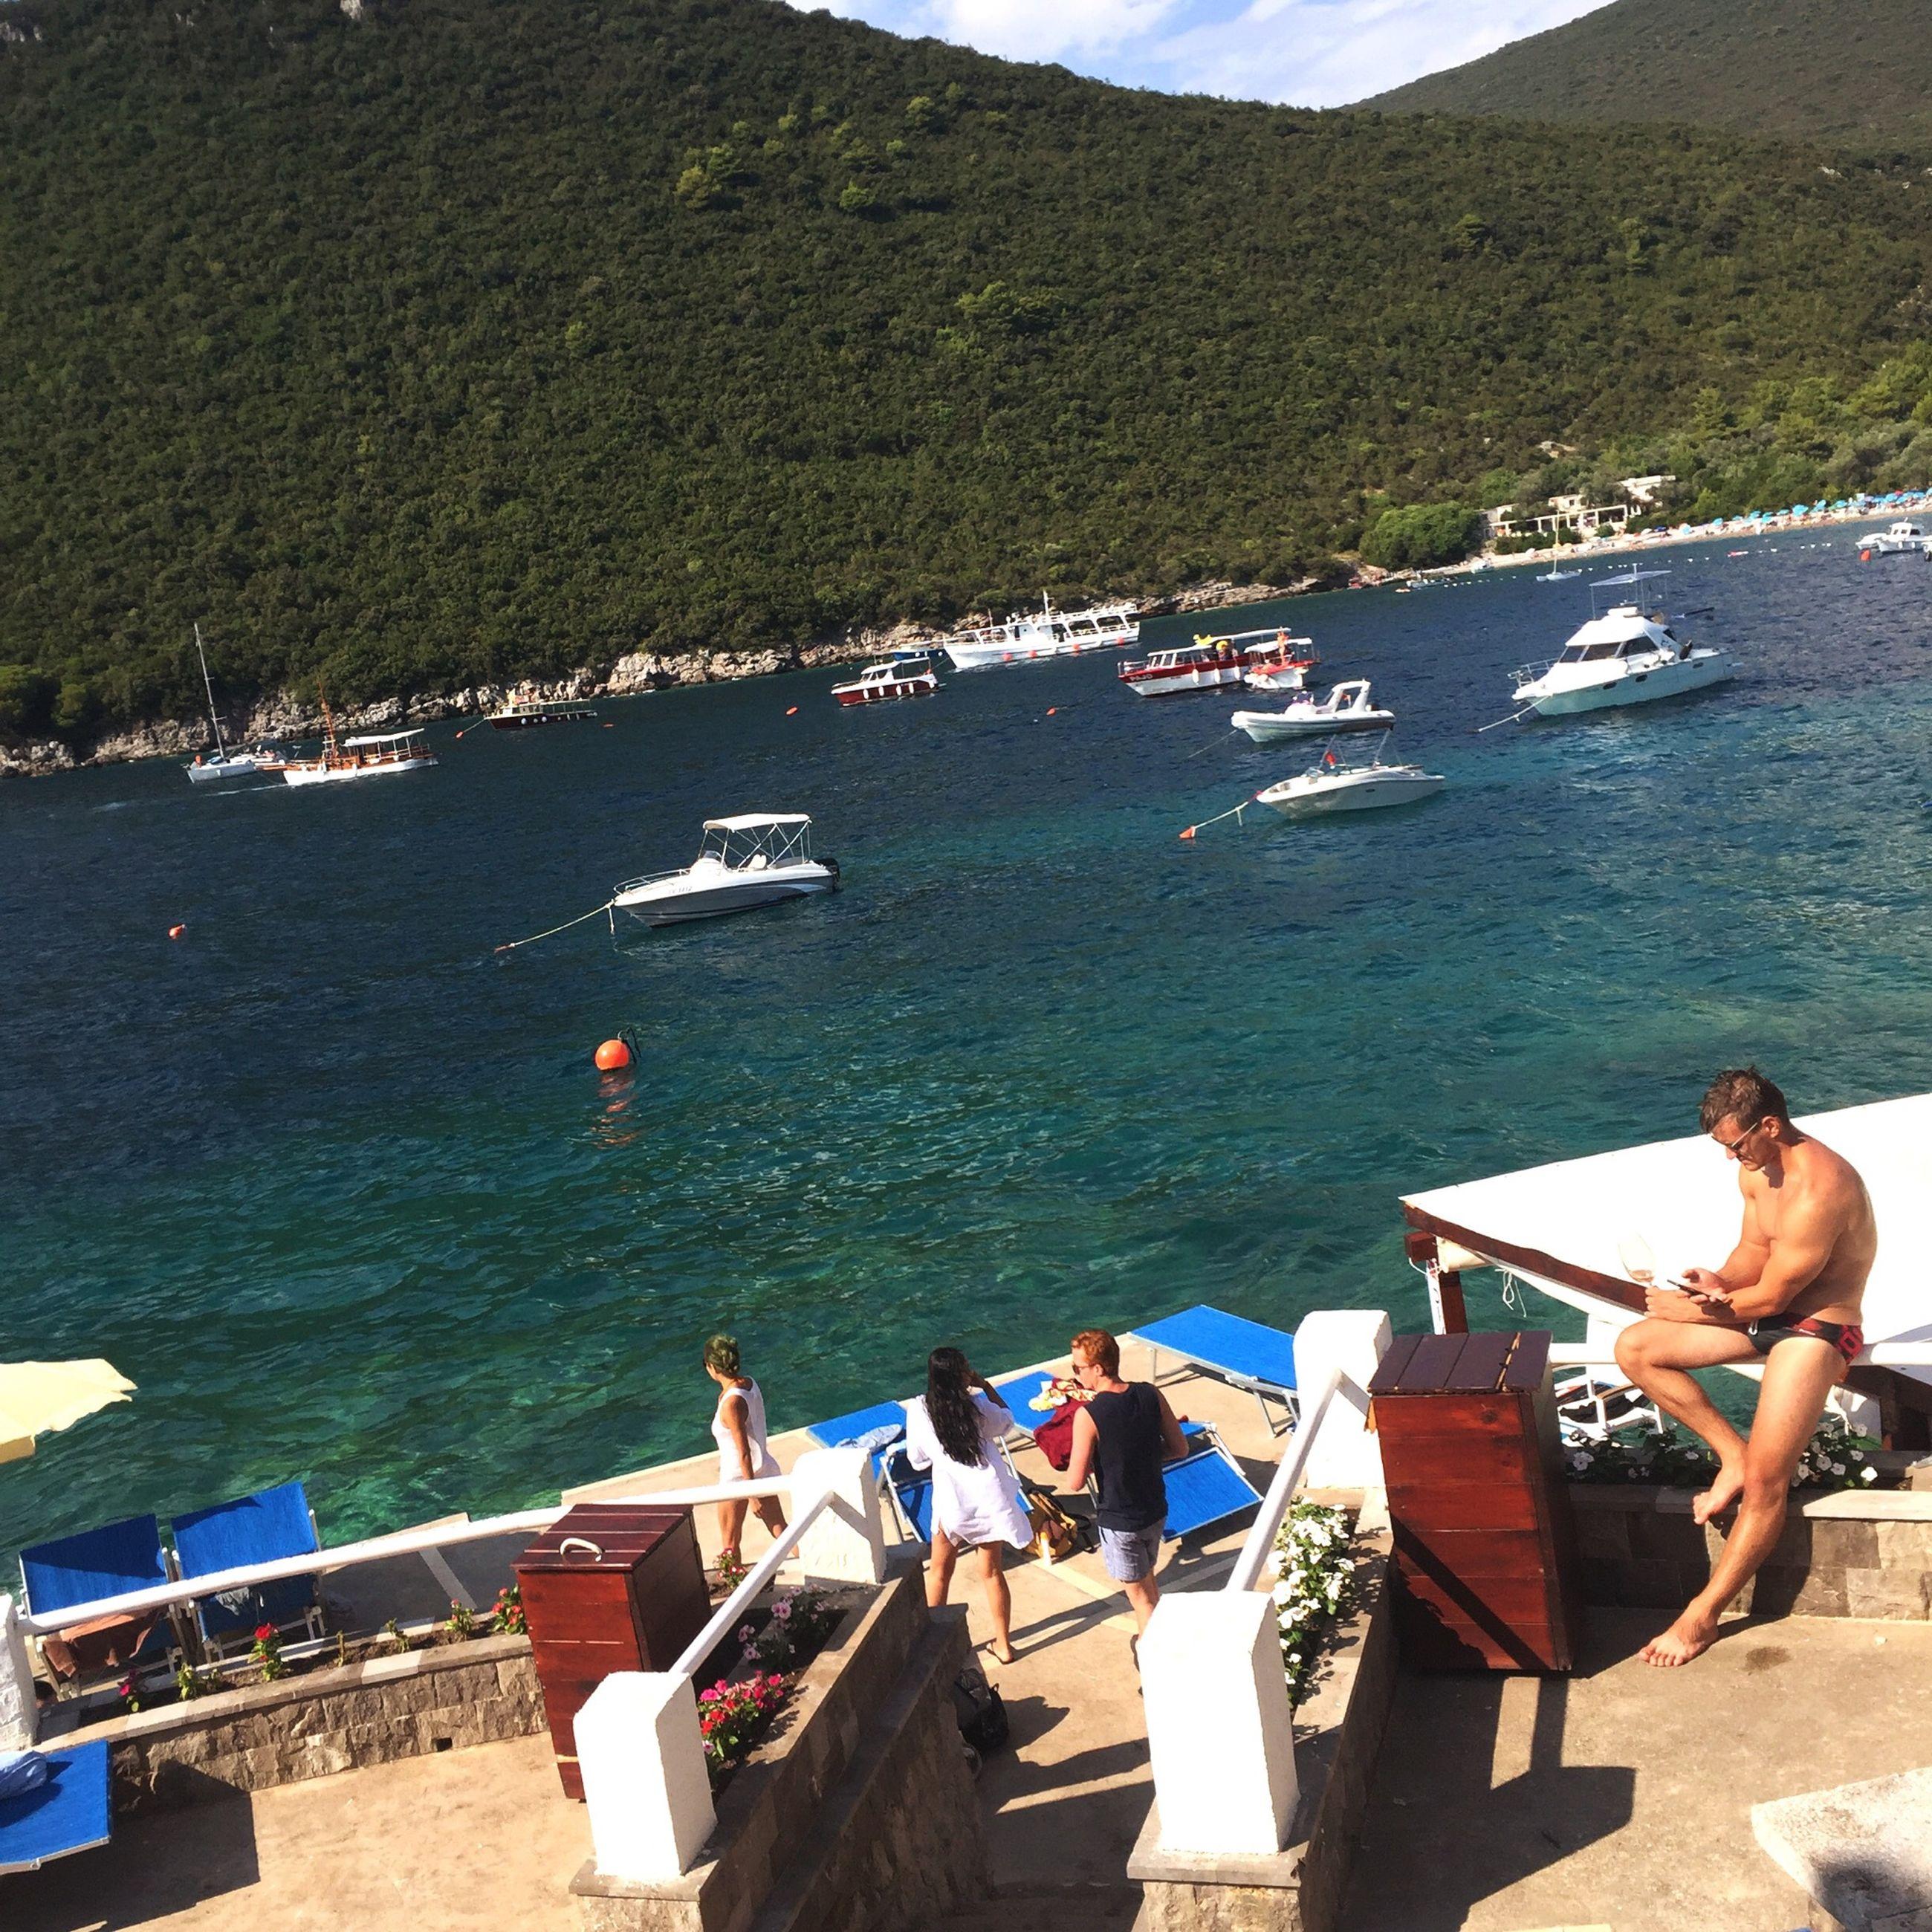 nautical vessel, transportation, boat, water, mode of transport, moored, mountain, ocean, tranquility, tranquil scene, lake, calm, sea, nature, non-urban scene, day, scenics, blue, jetty, outdoors, coastline, solitude, remote, shore, seaside